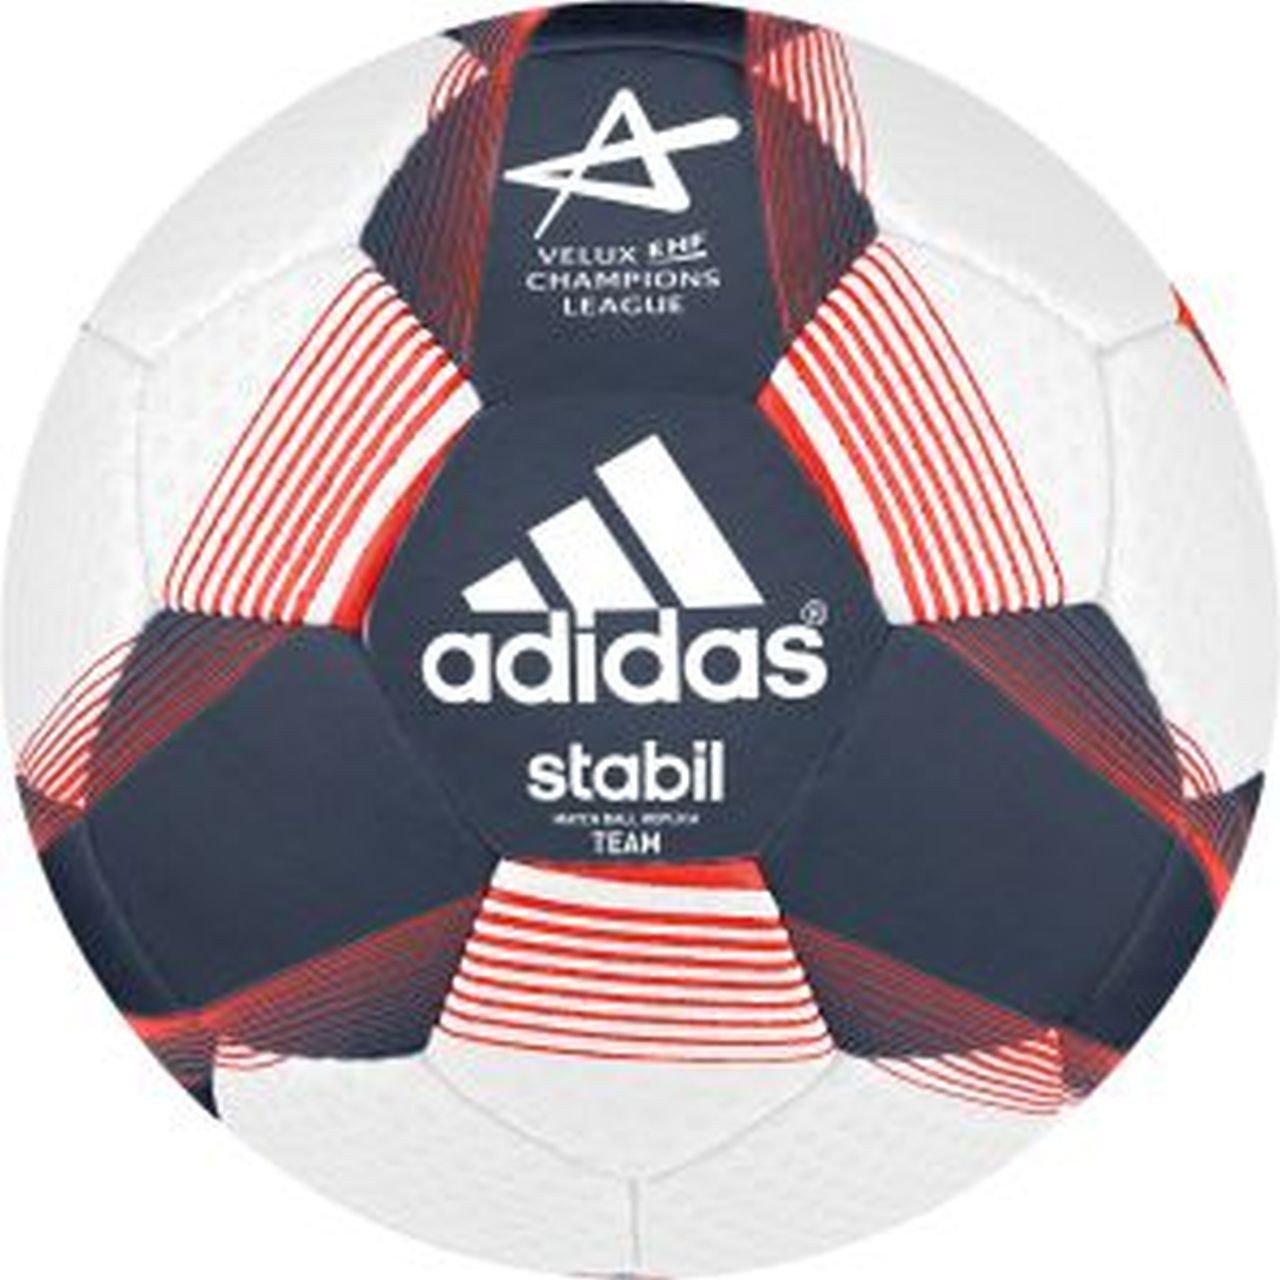 adidas balón de Balonmano Stabil Team Sport 7 Ricblu/White/Sol ...